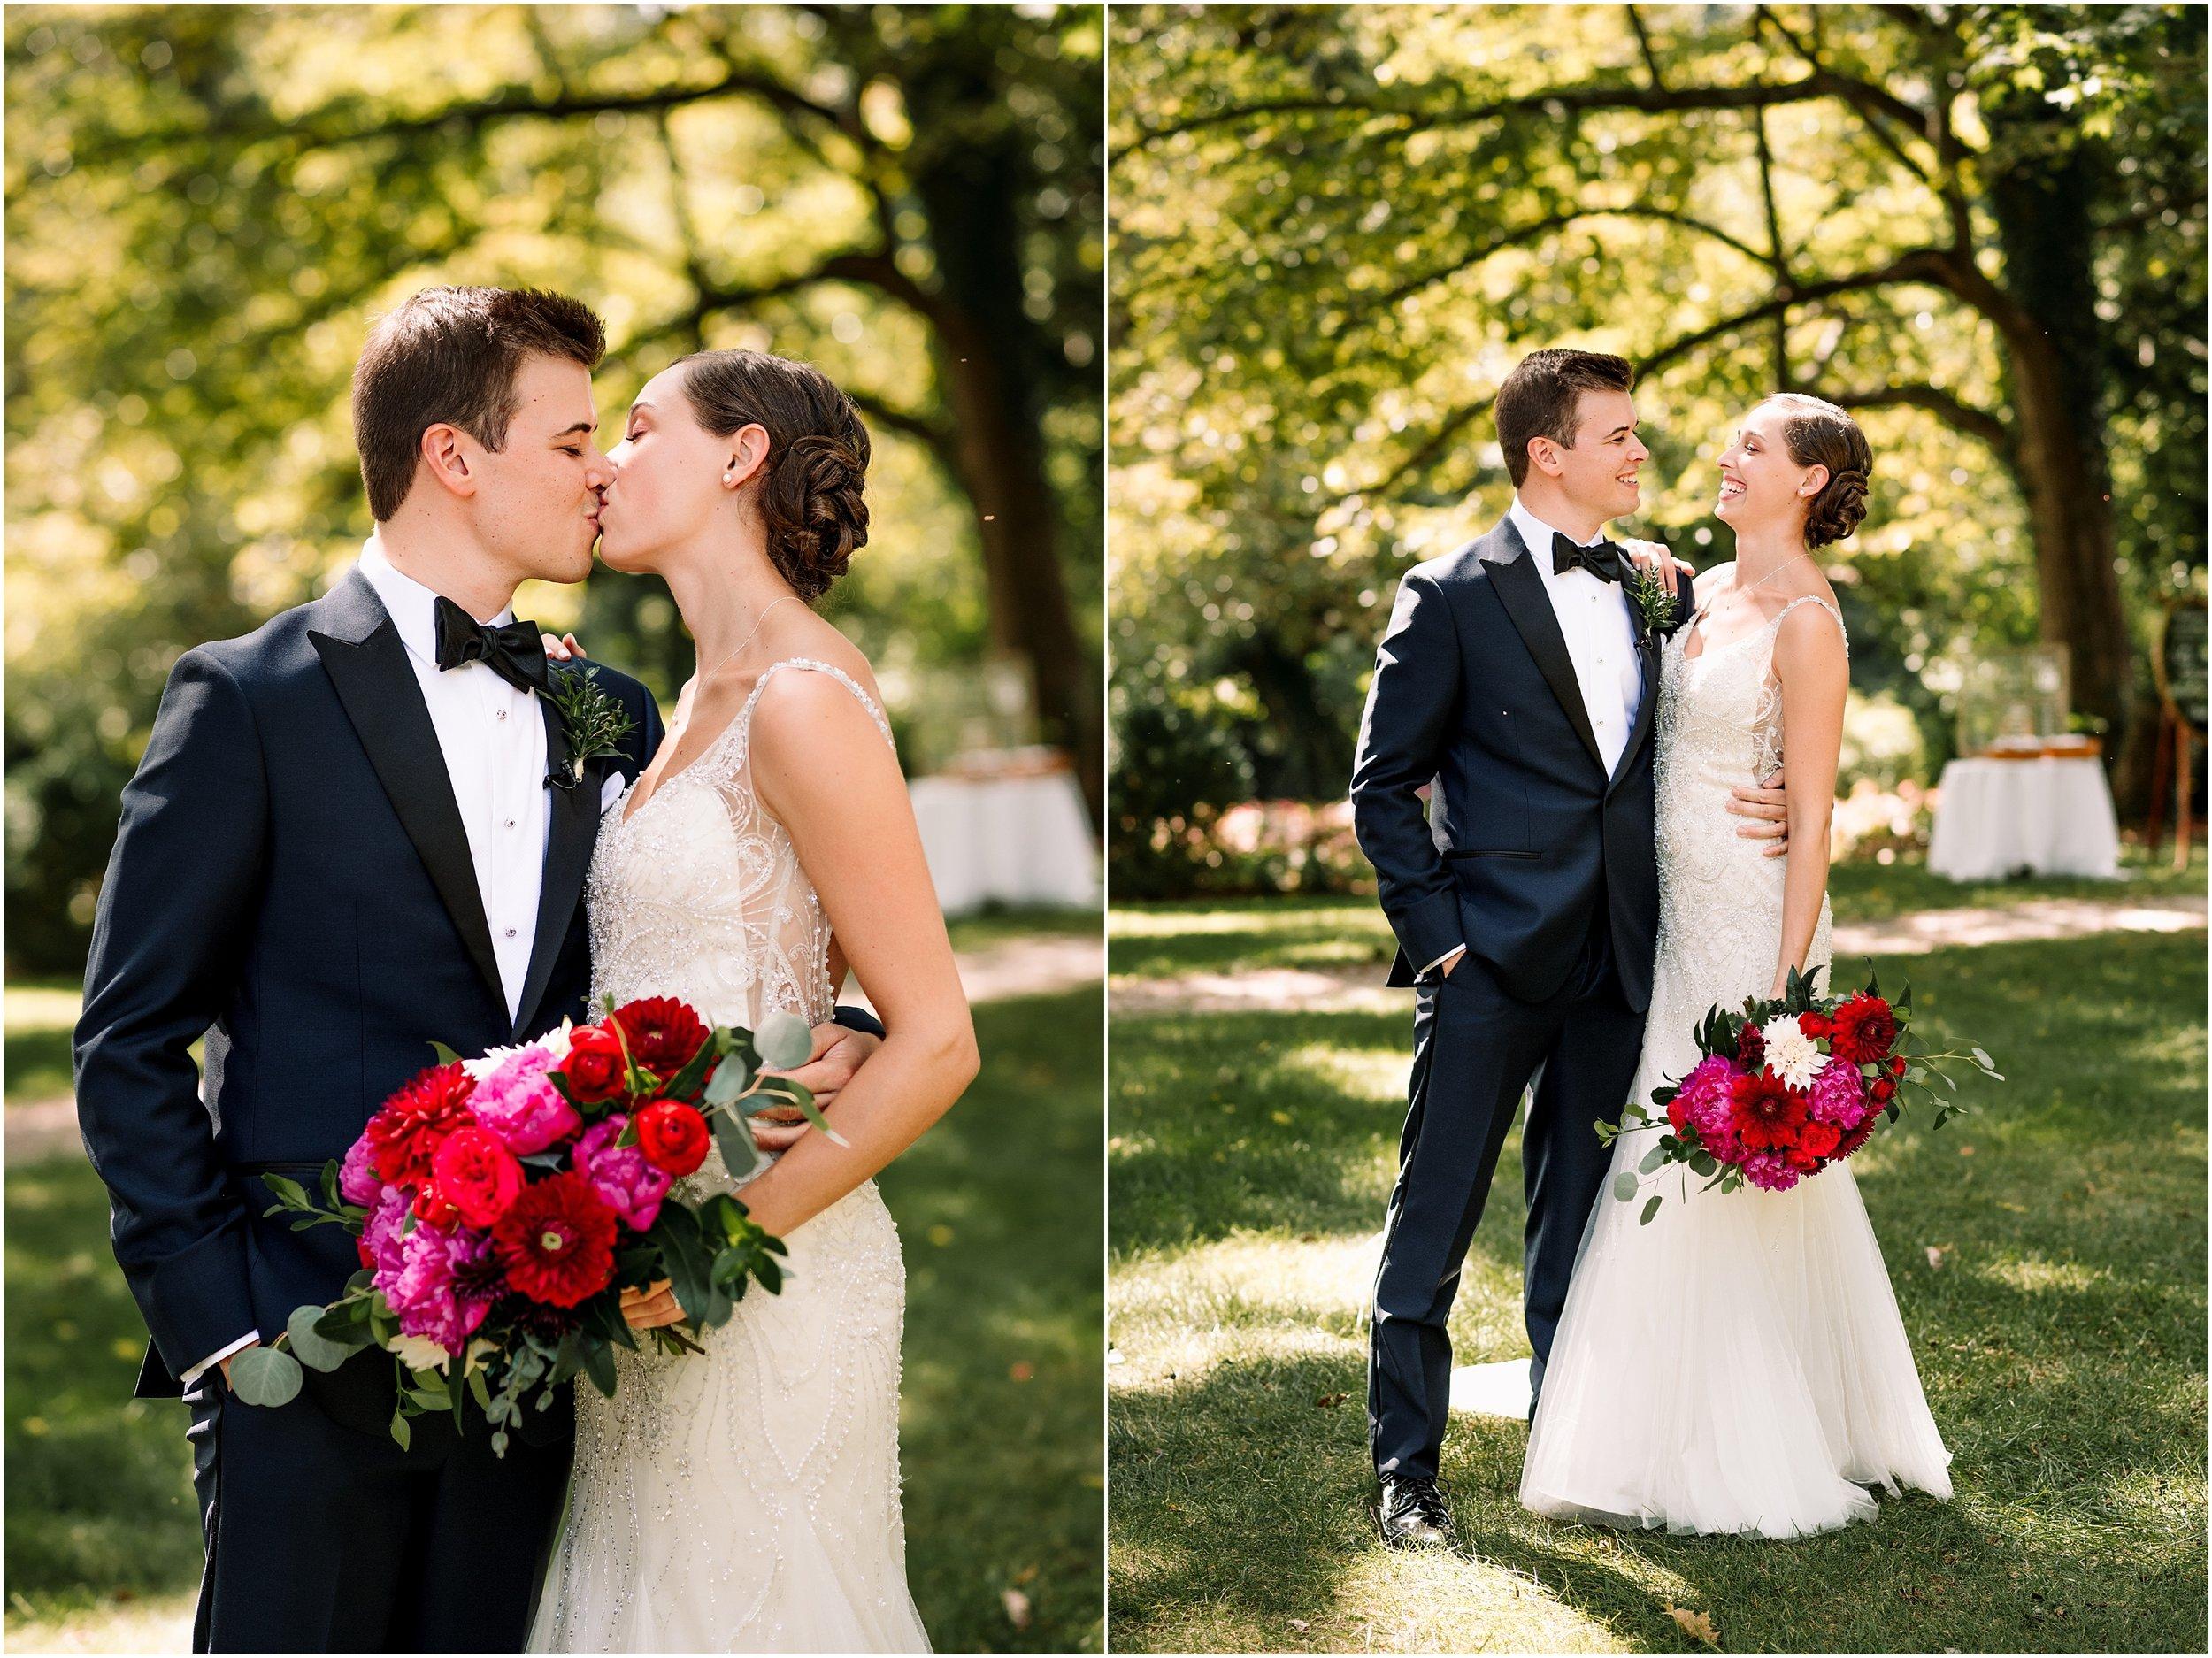 hannah leigh photography Antrim 1844 Wedding_1165.jpg